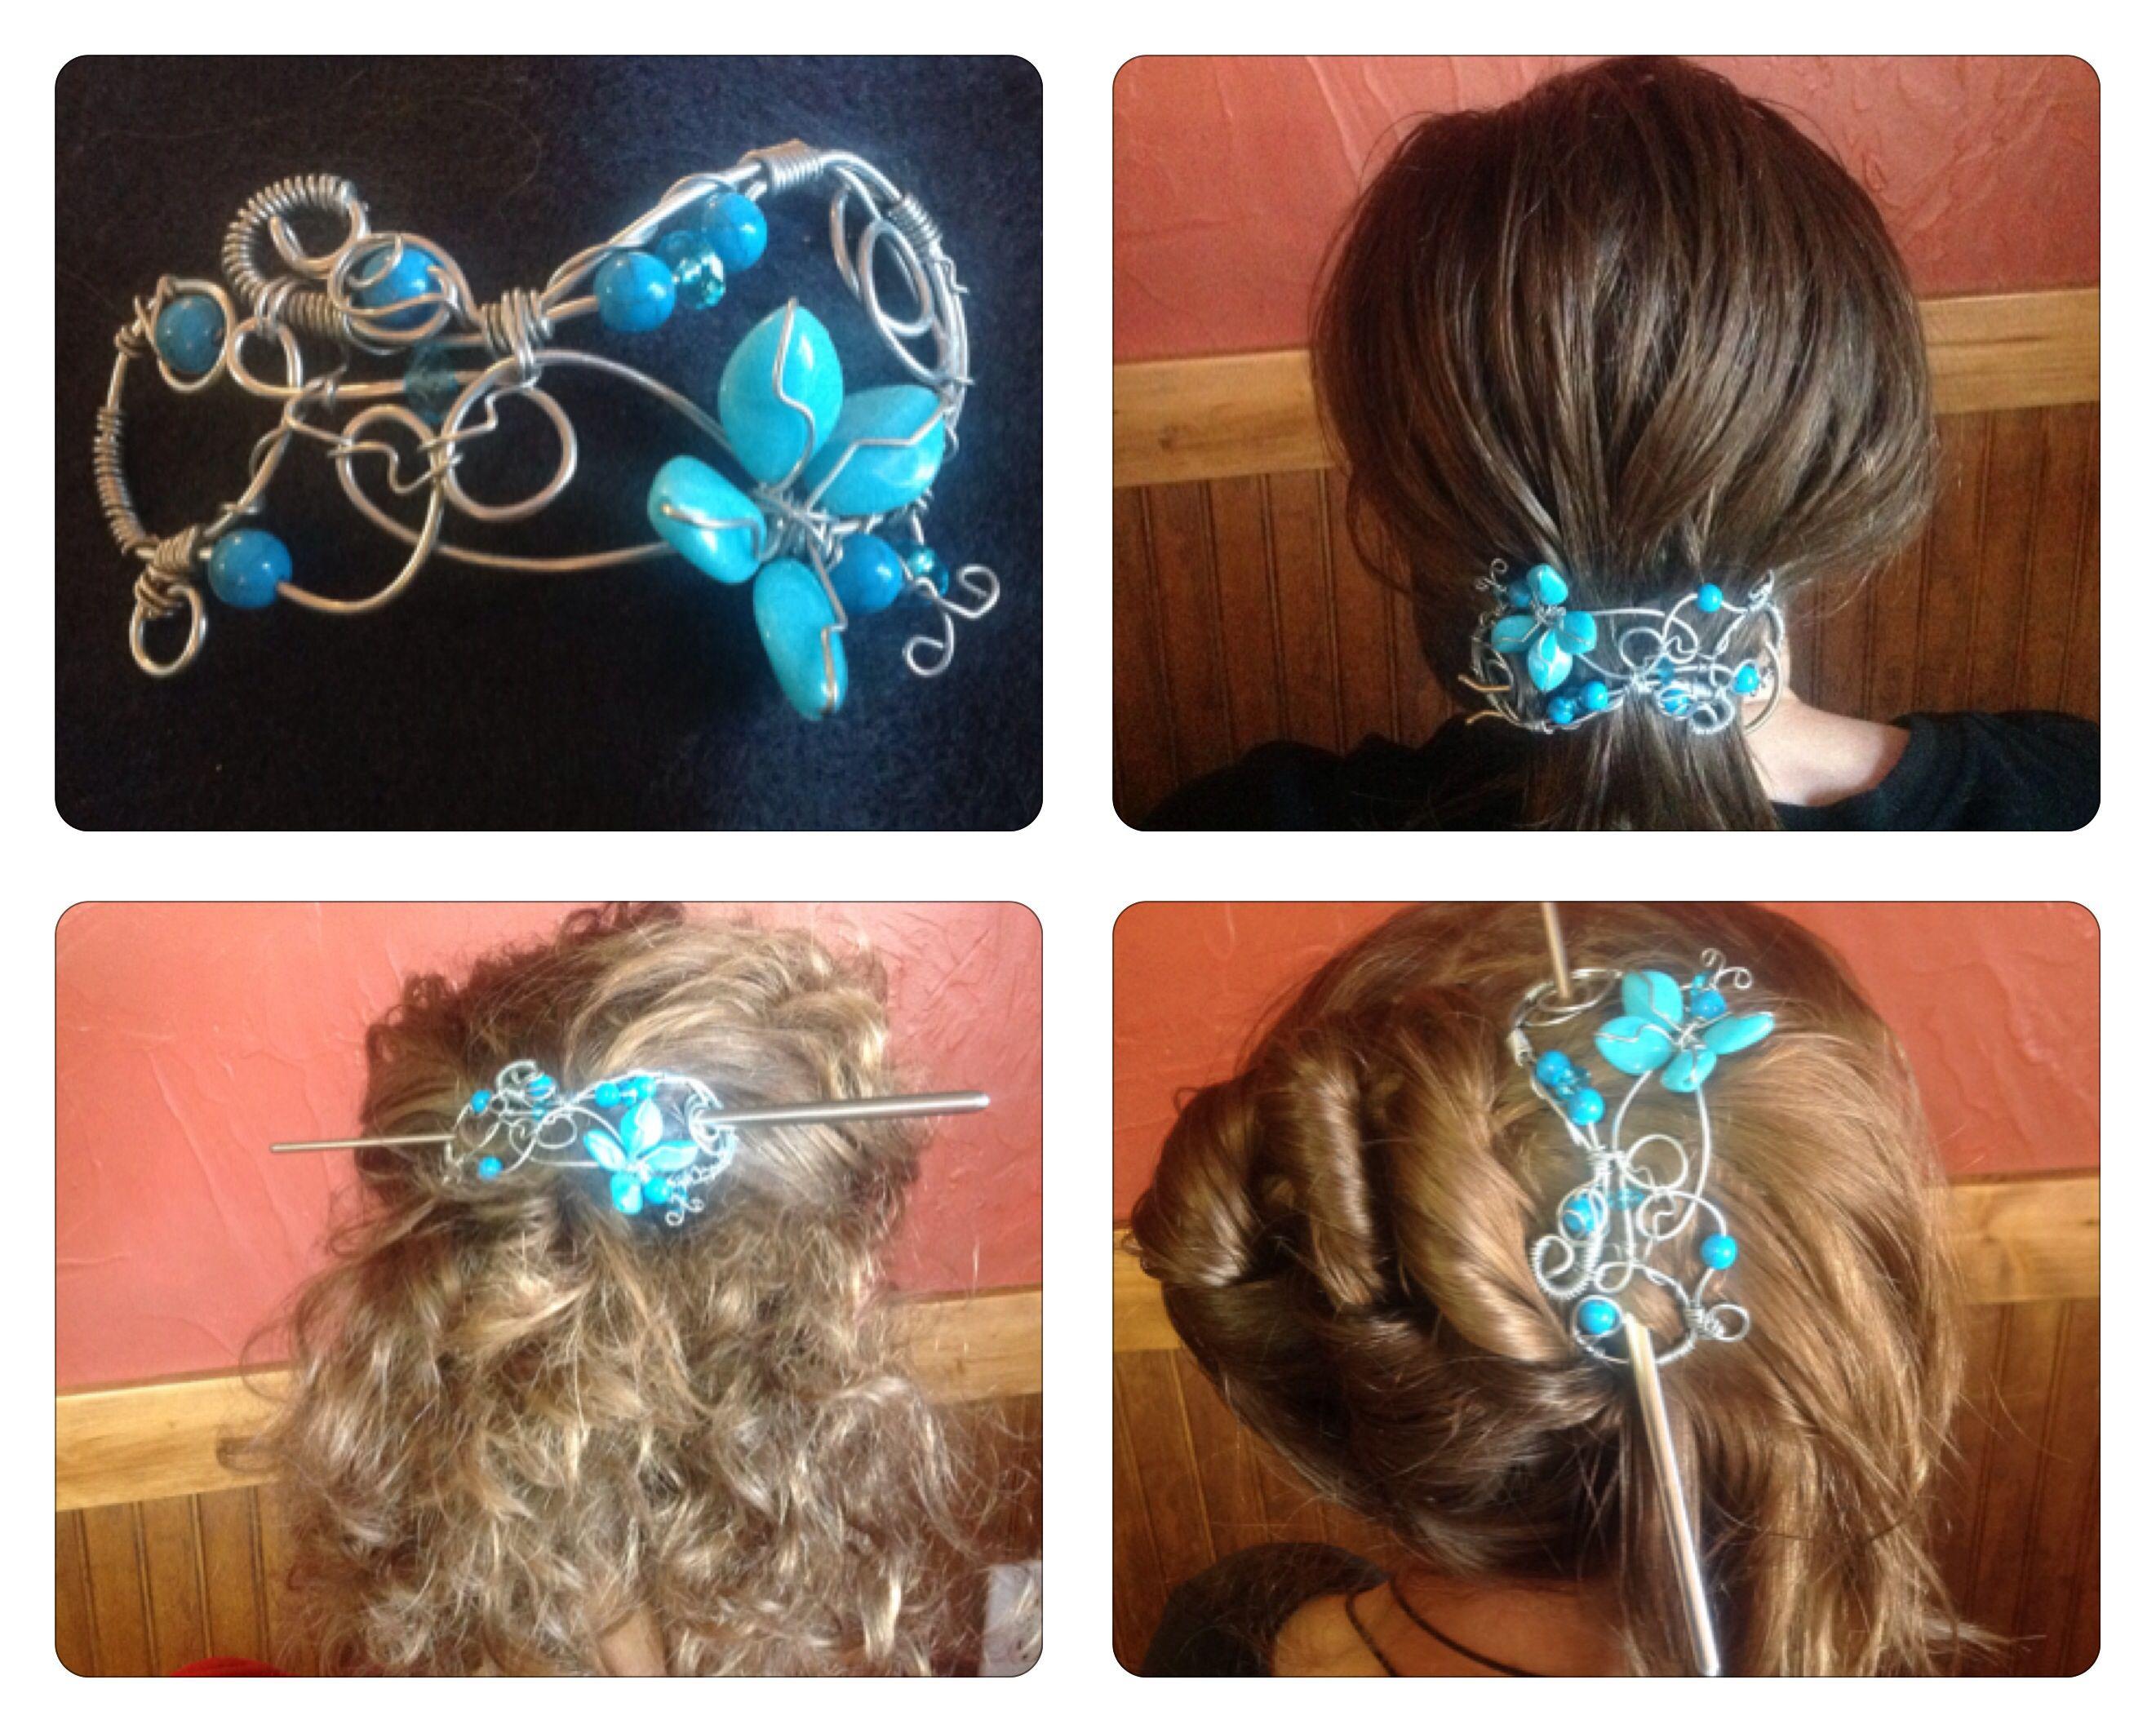 Gorgeous hair pieces. No info